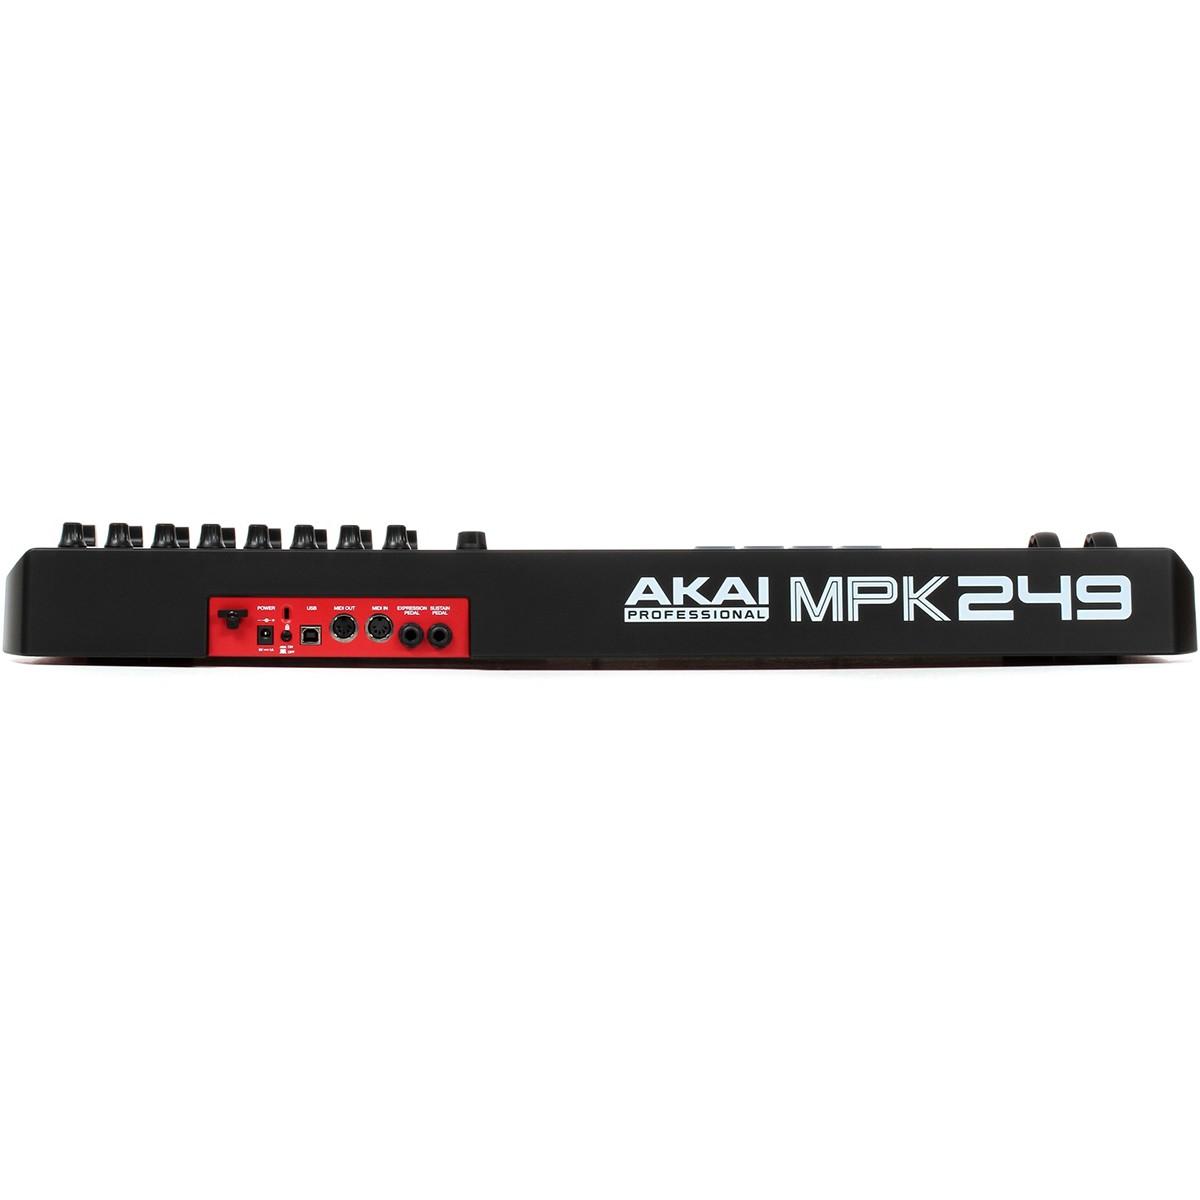 Akai MPK249 Controladora Teclado Midi, Usb, Bivolt